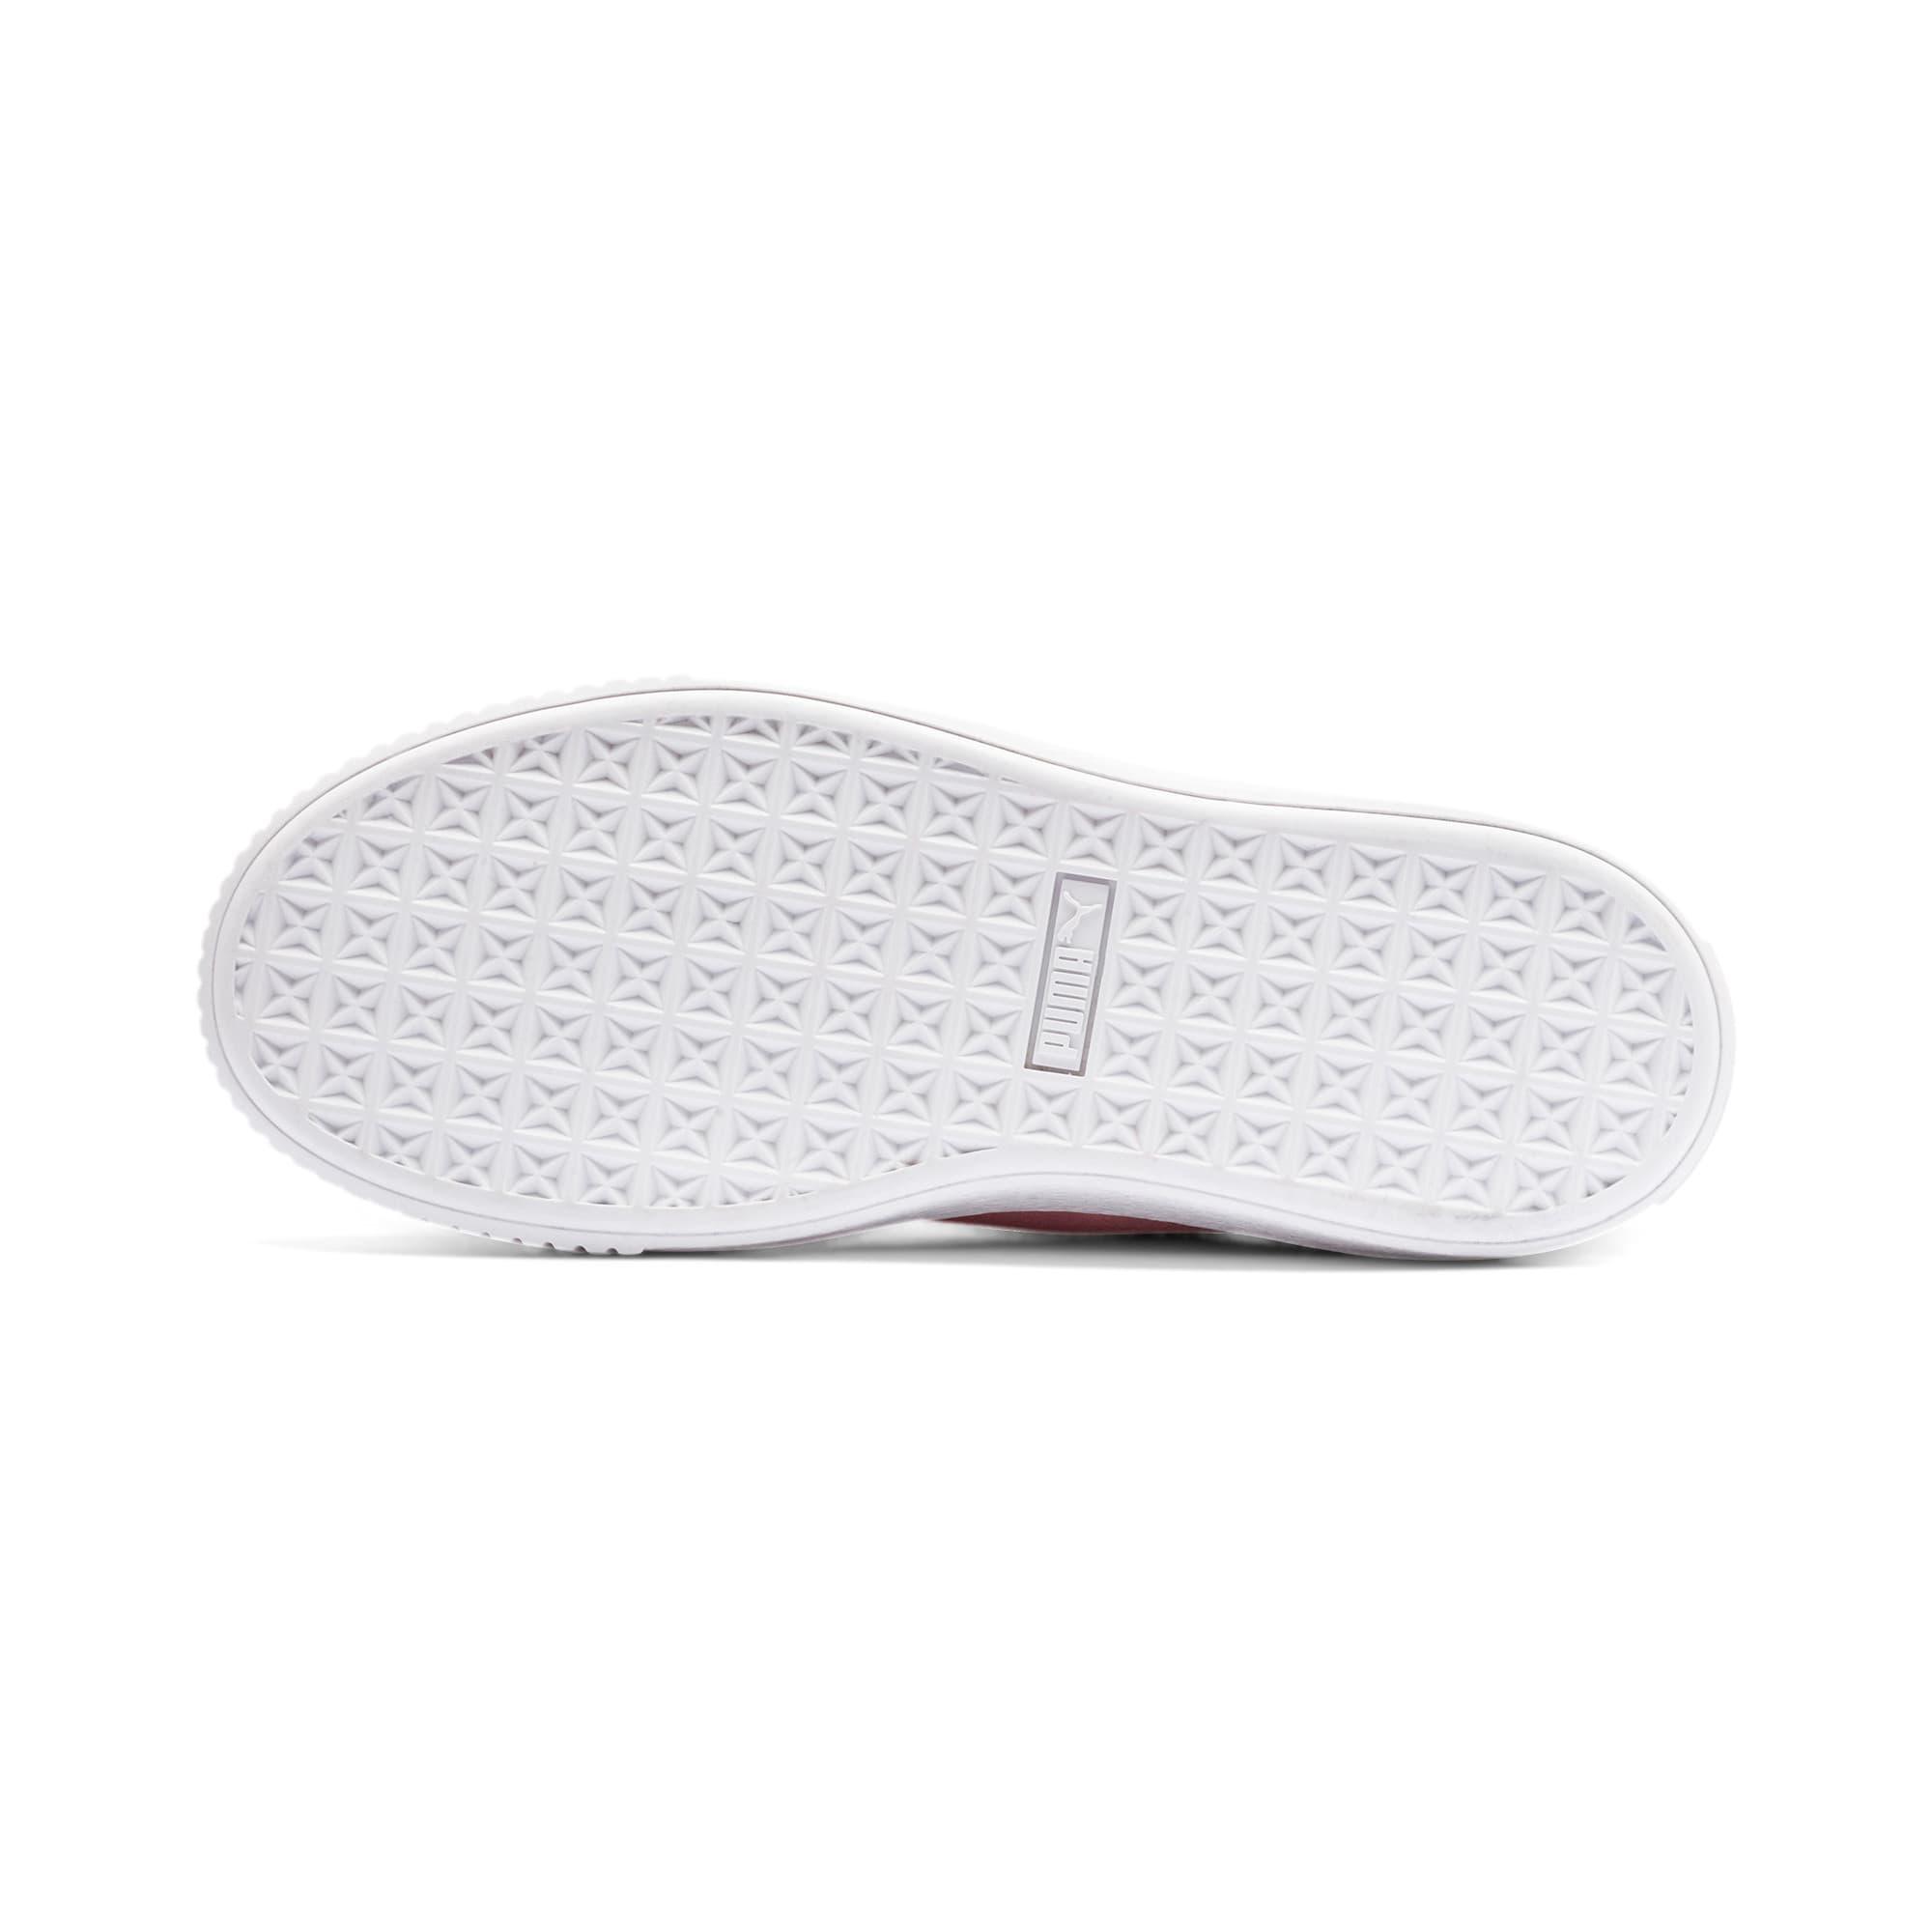 Thumbnail 4 of Suede Platform Women's Sneakers, Bridal Rose-Puma Team Gold, medium